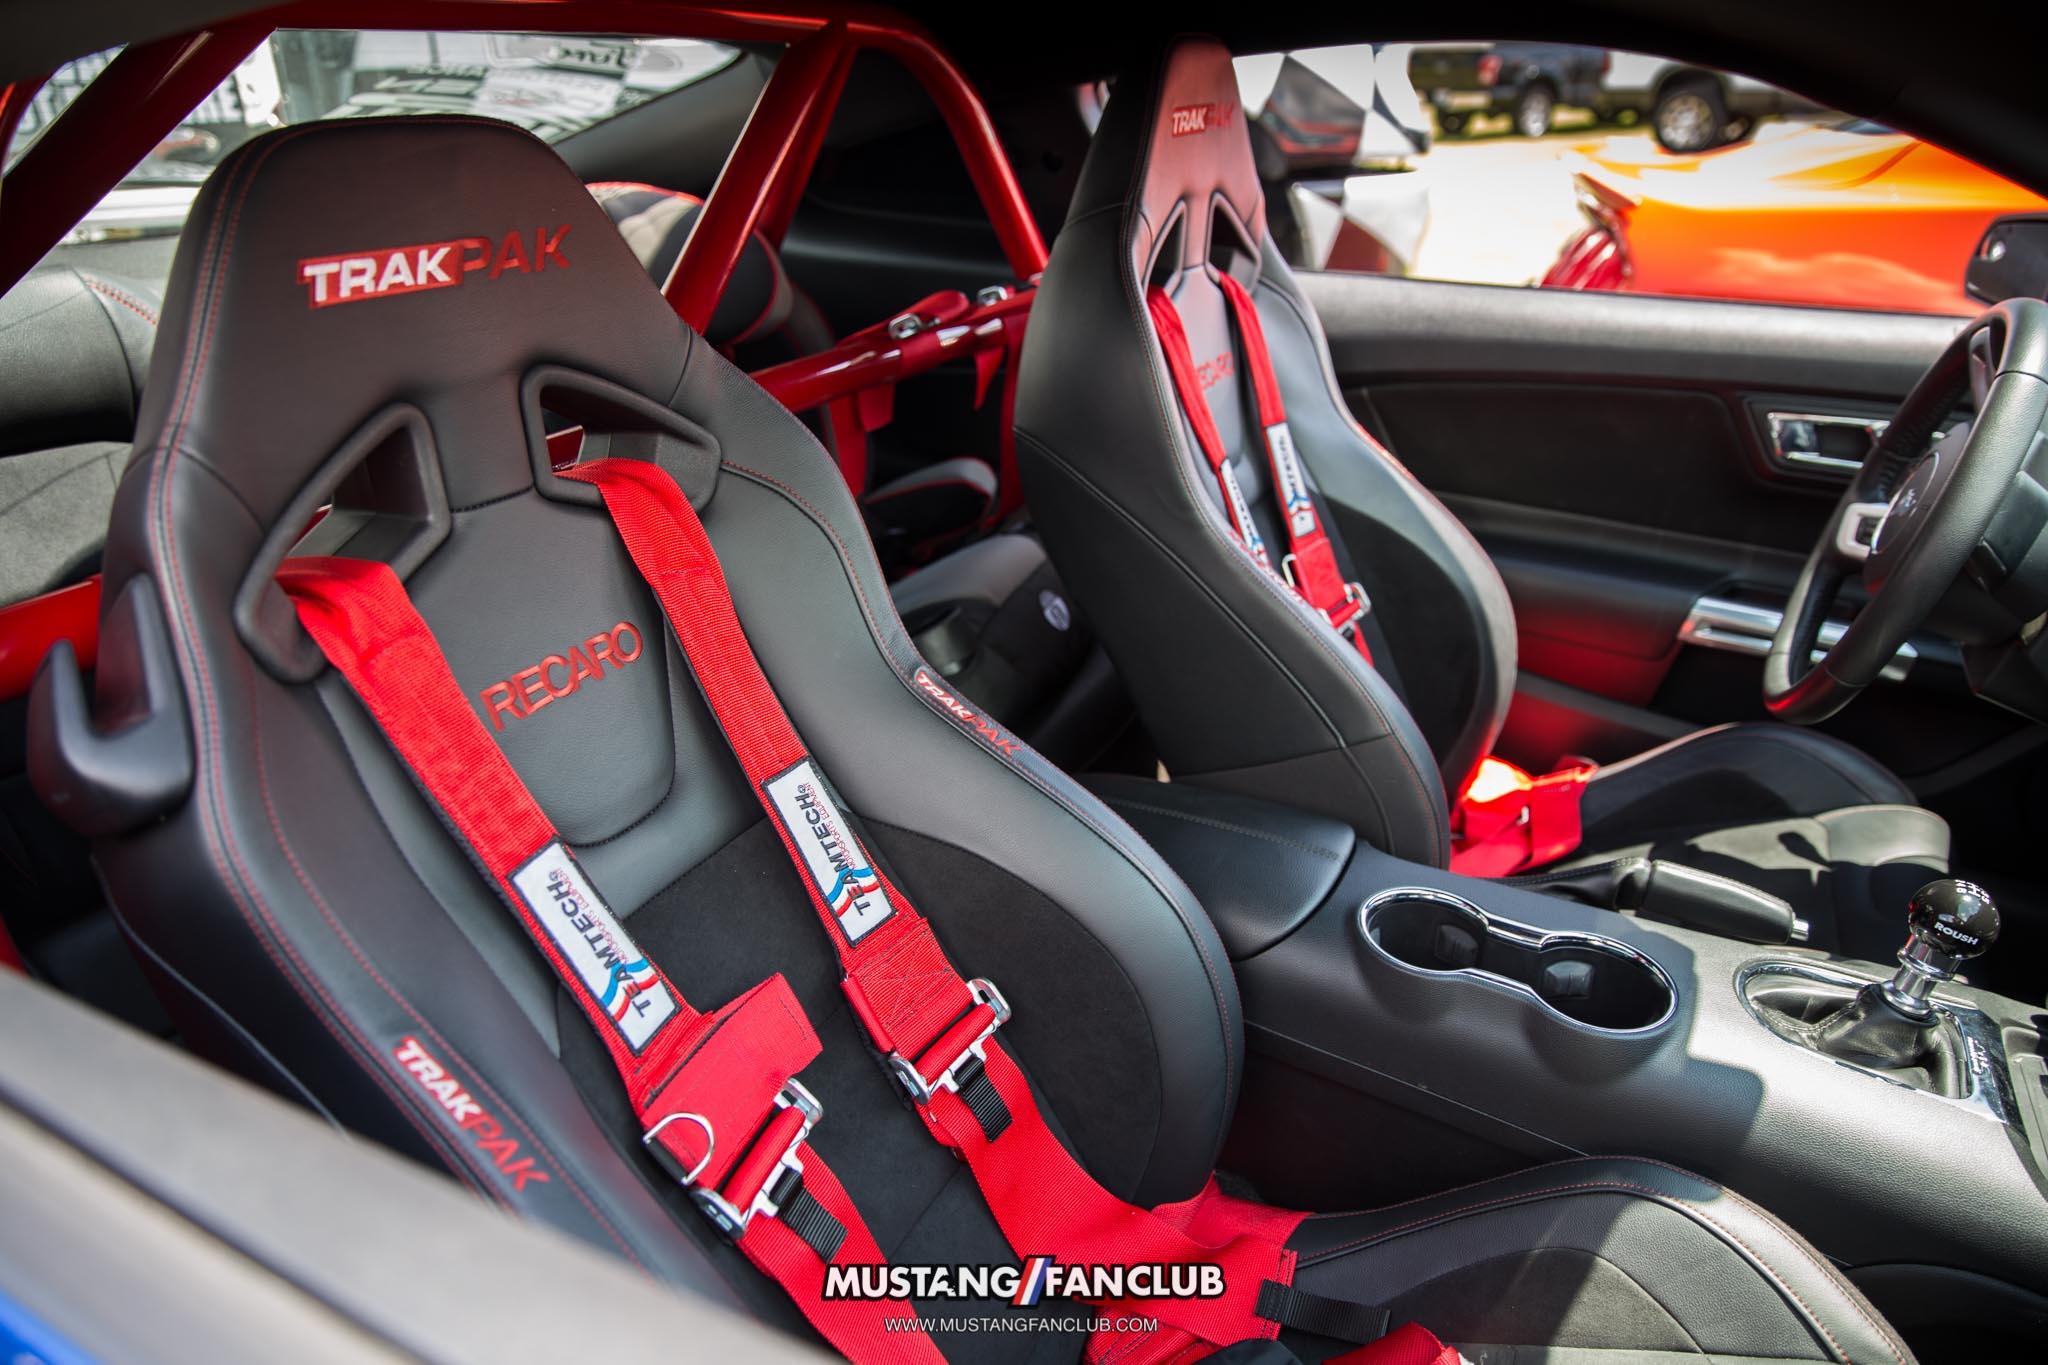 roush performance trakpak mustang fan club mustangfanclub interior recaro race seats